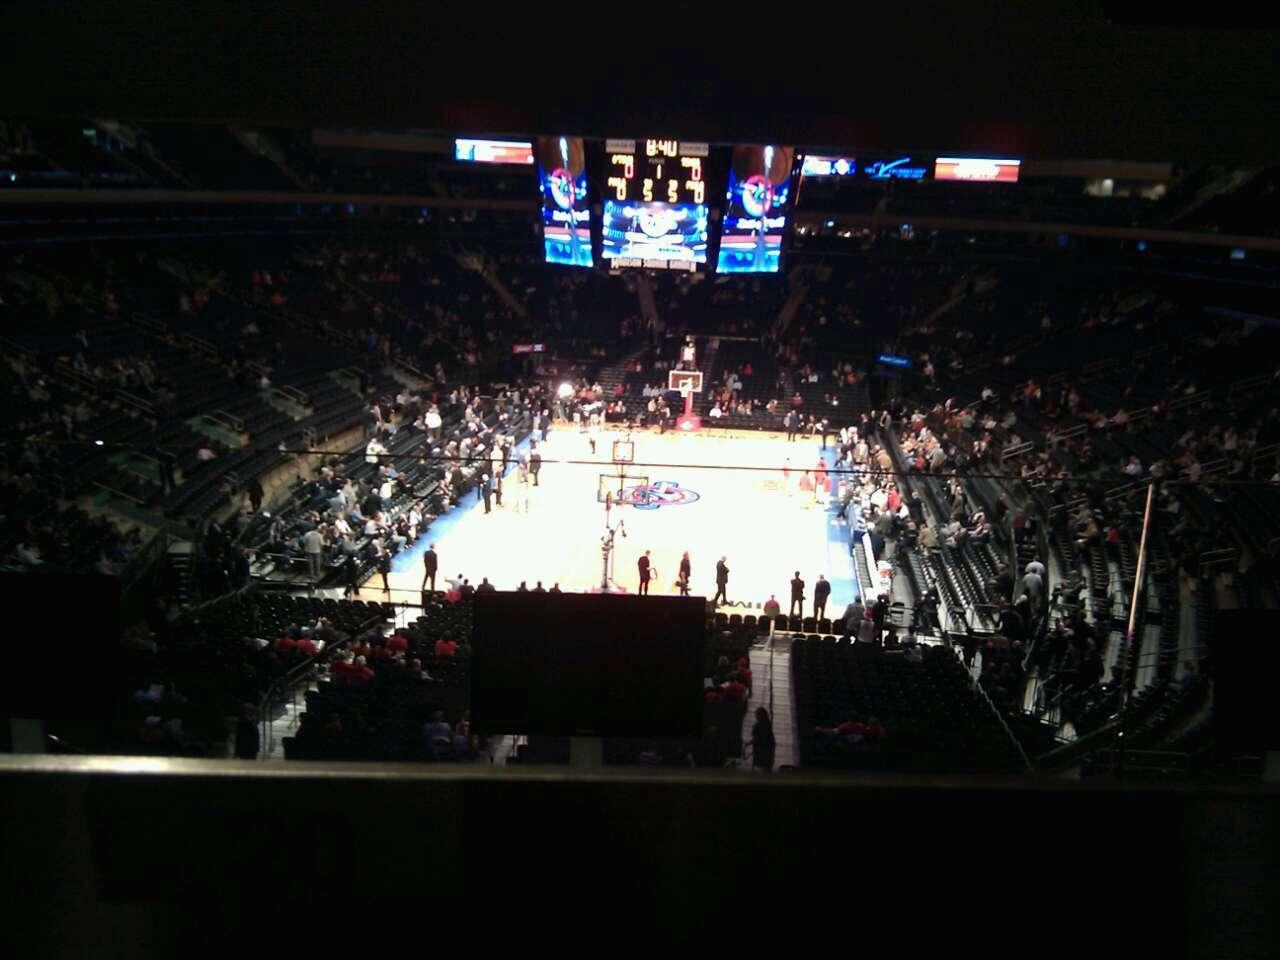 Madison Square Garden Section 204 Row Bar Rail Seat 20 Georgetown Hoyas Vs Texas Longhorns